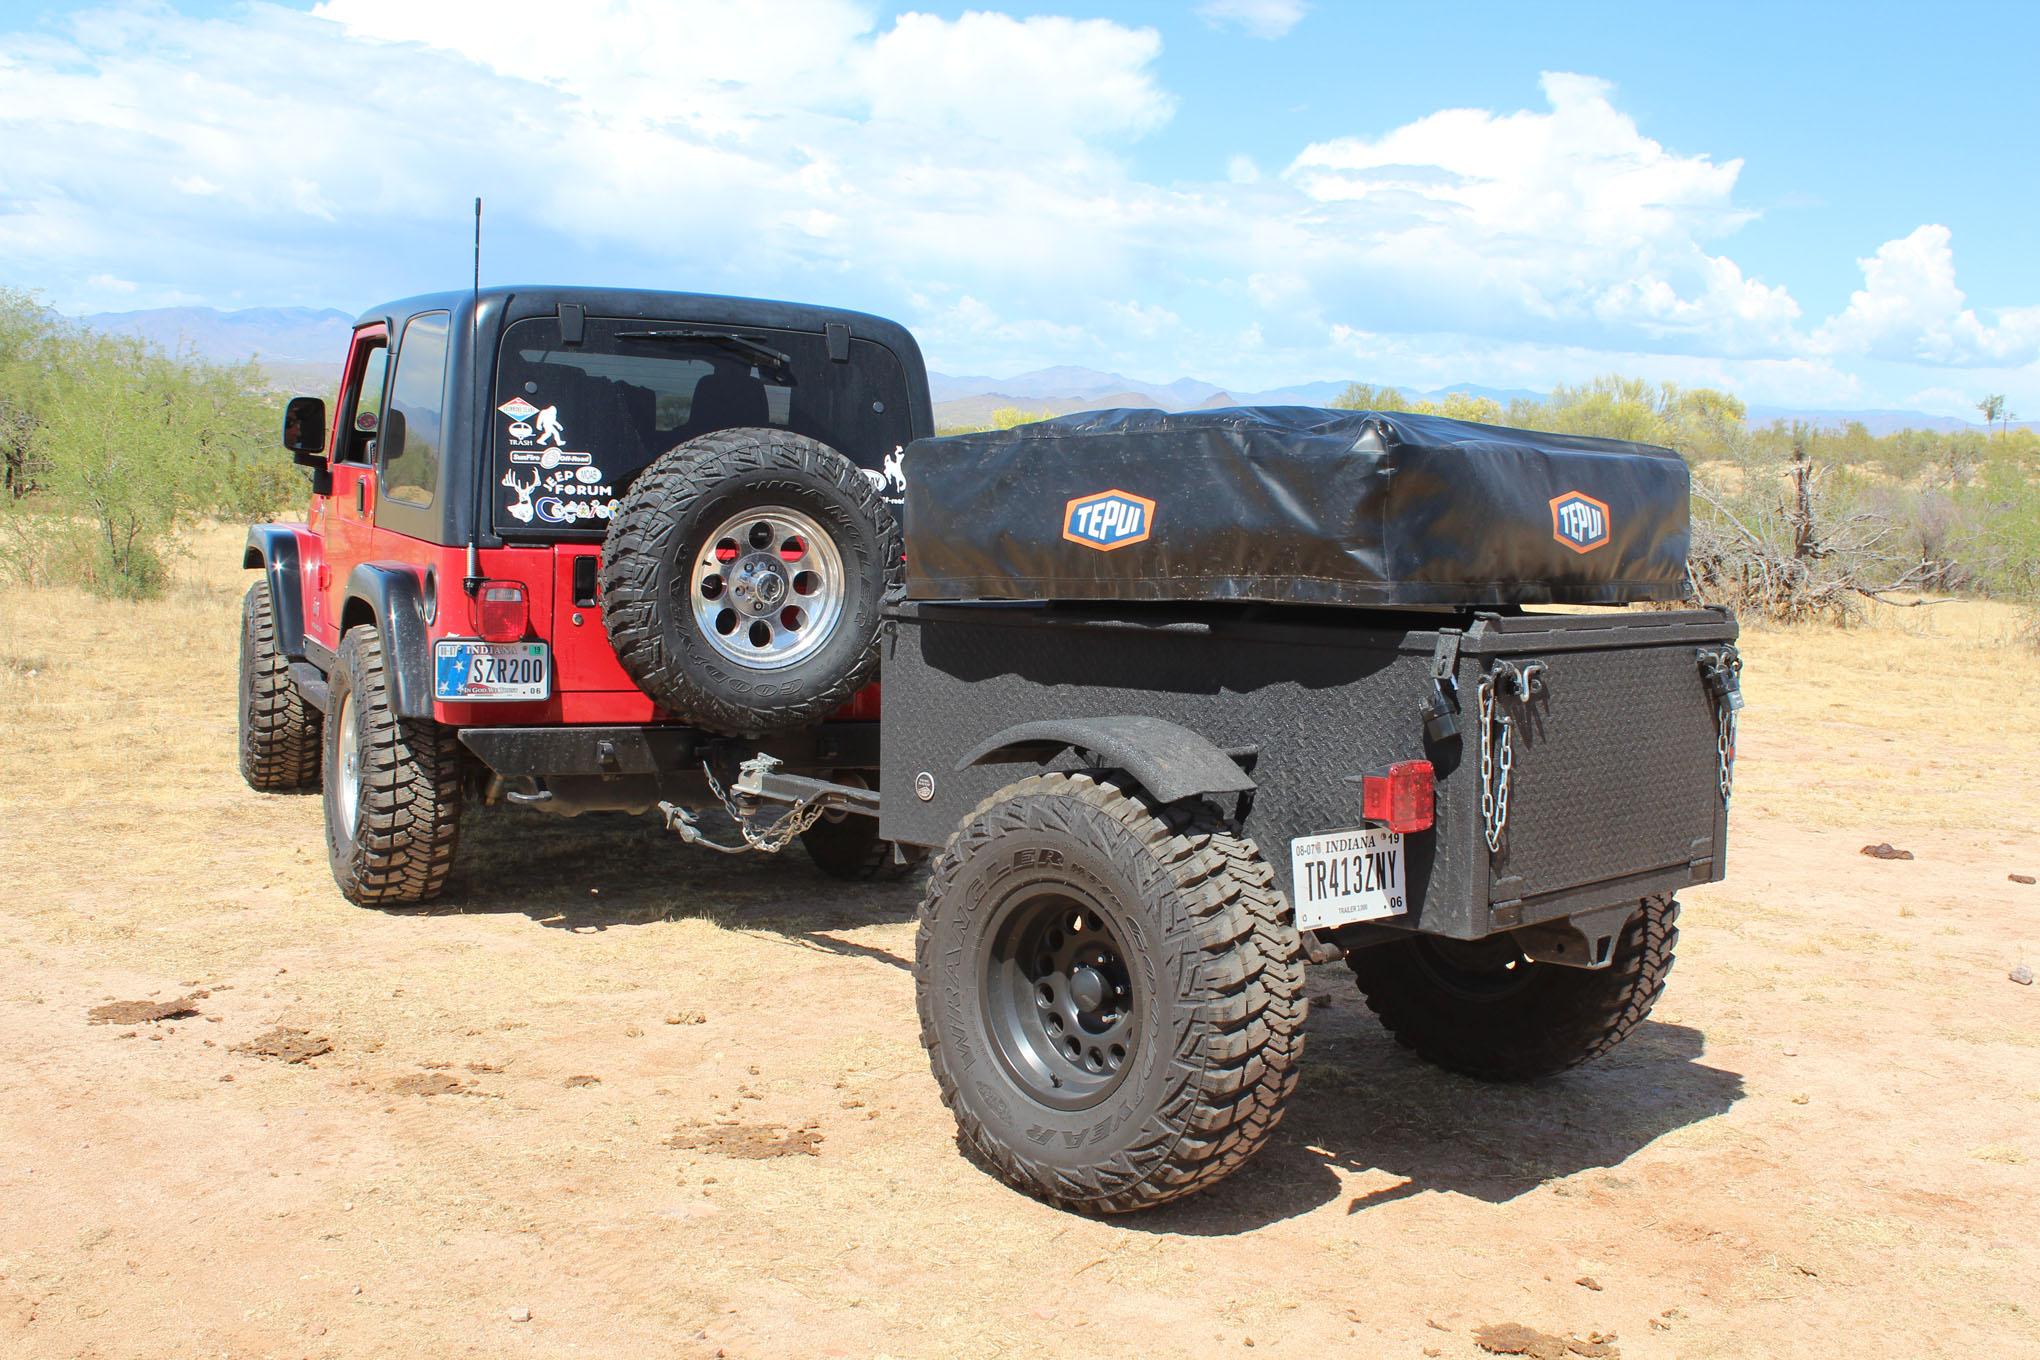 026 four wheeler aaron meyer 2006 jeep wrangler